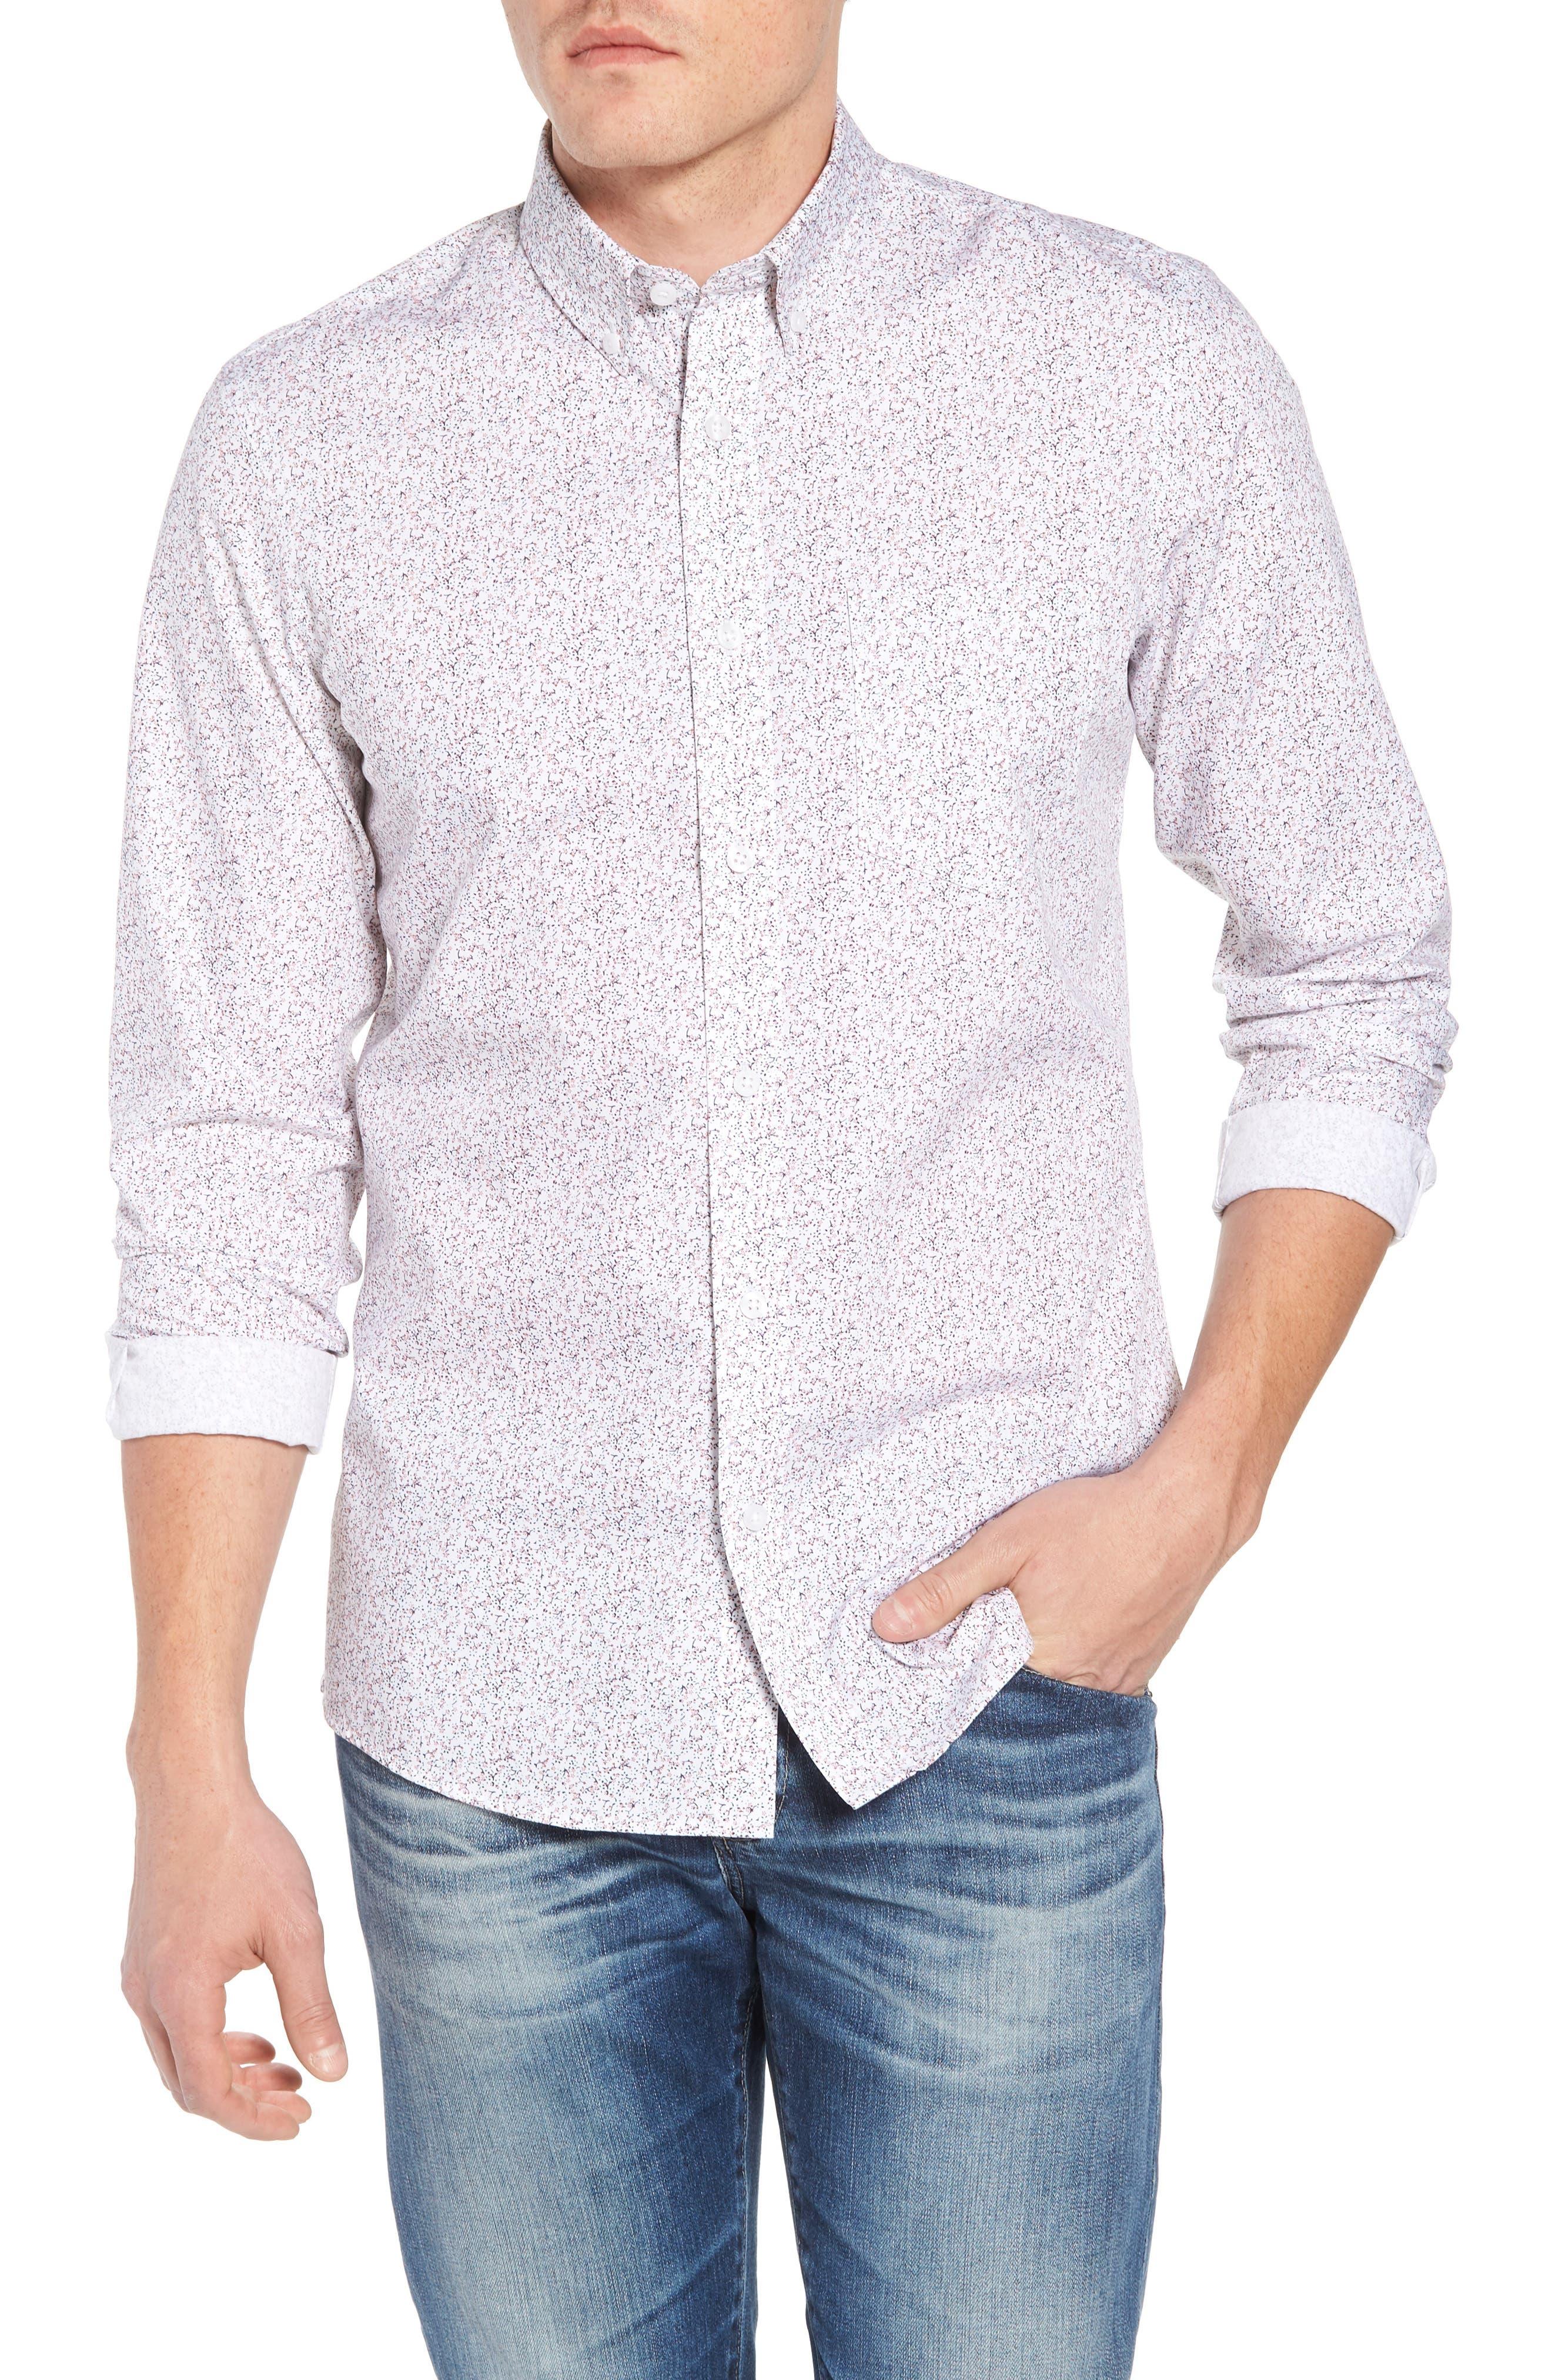 Trim Fit Print Sport Shirt,                             Main thumbnail 1, color,                             WHITE NAVY SPRING FLORAL